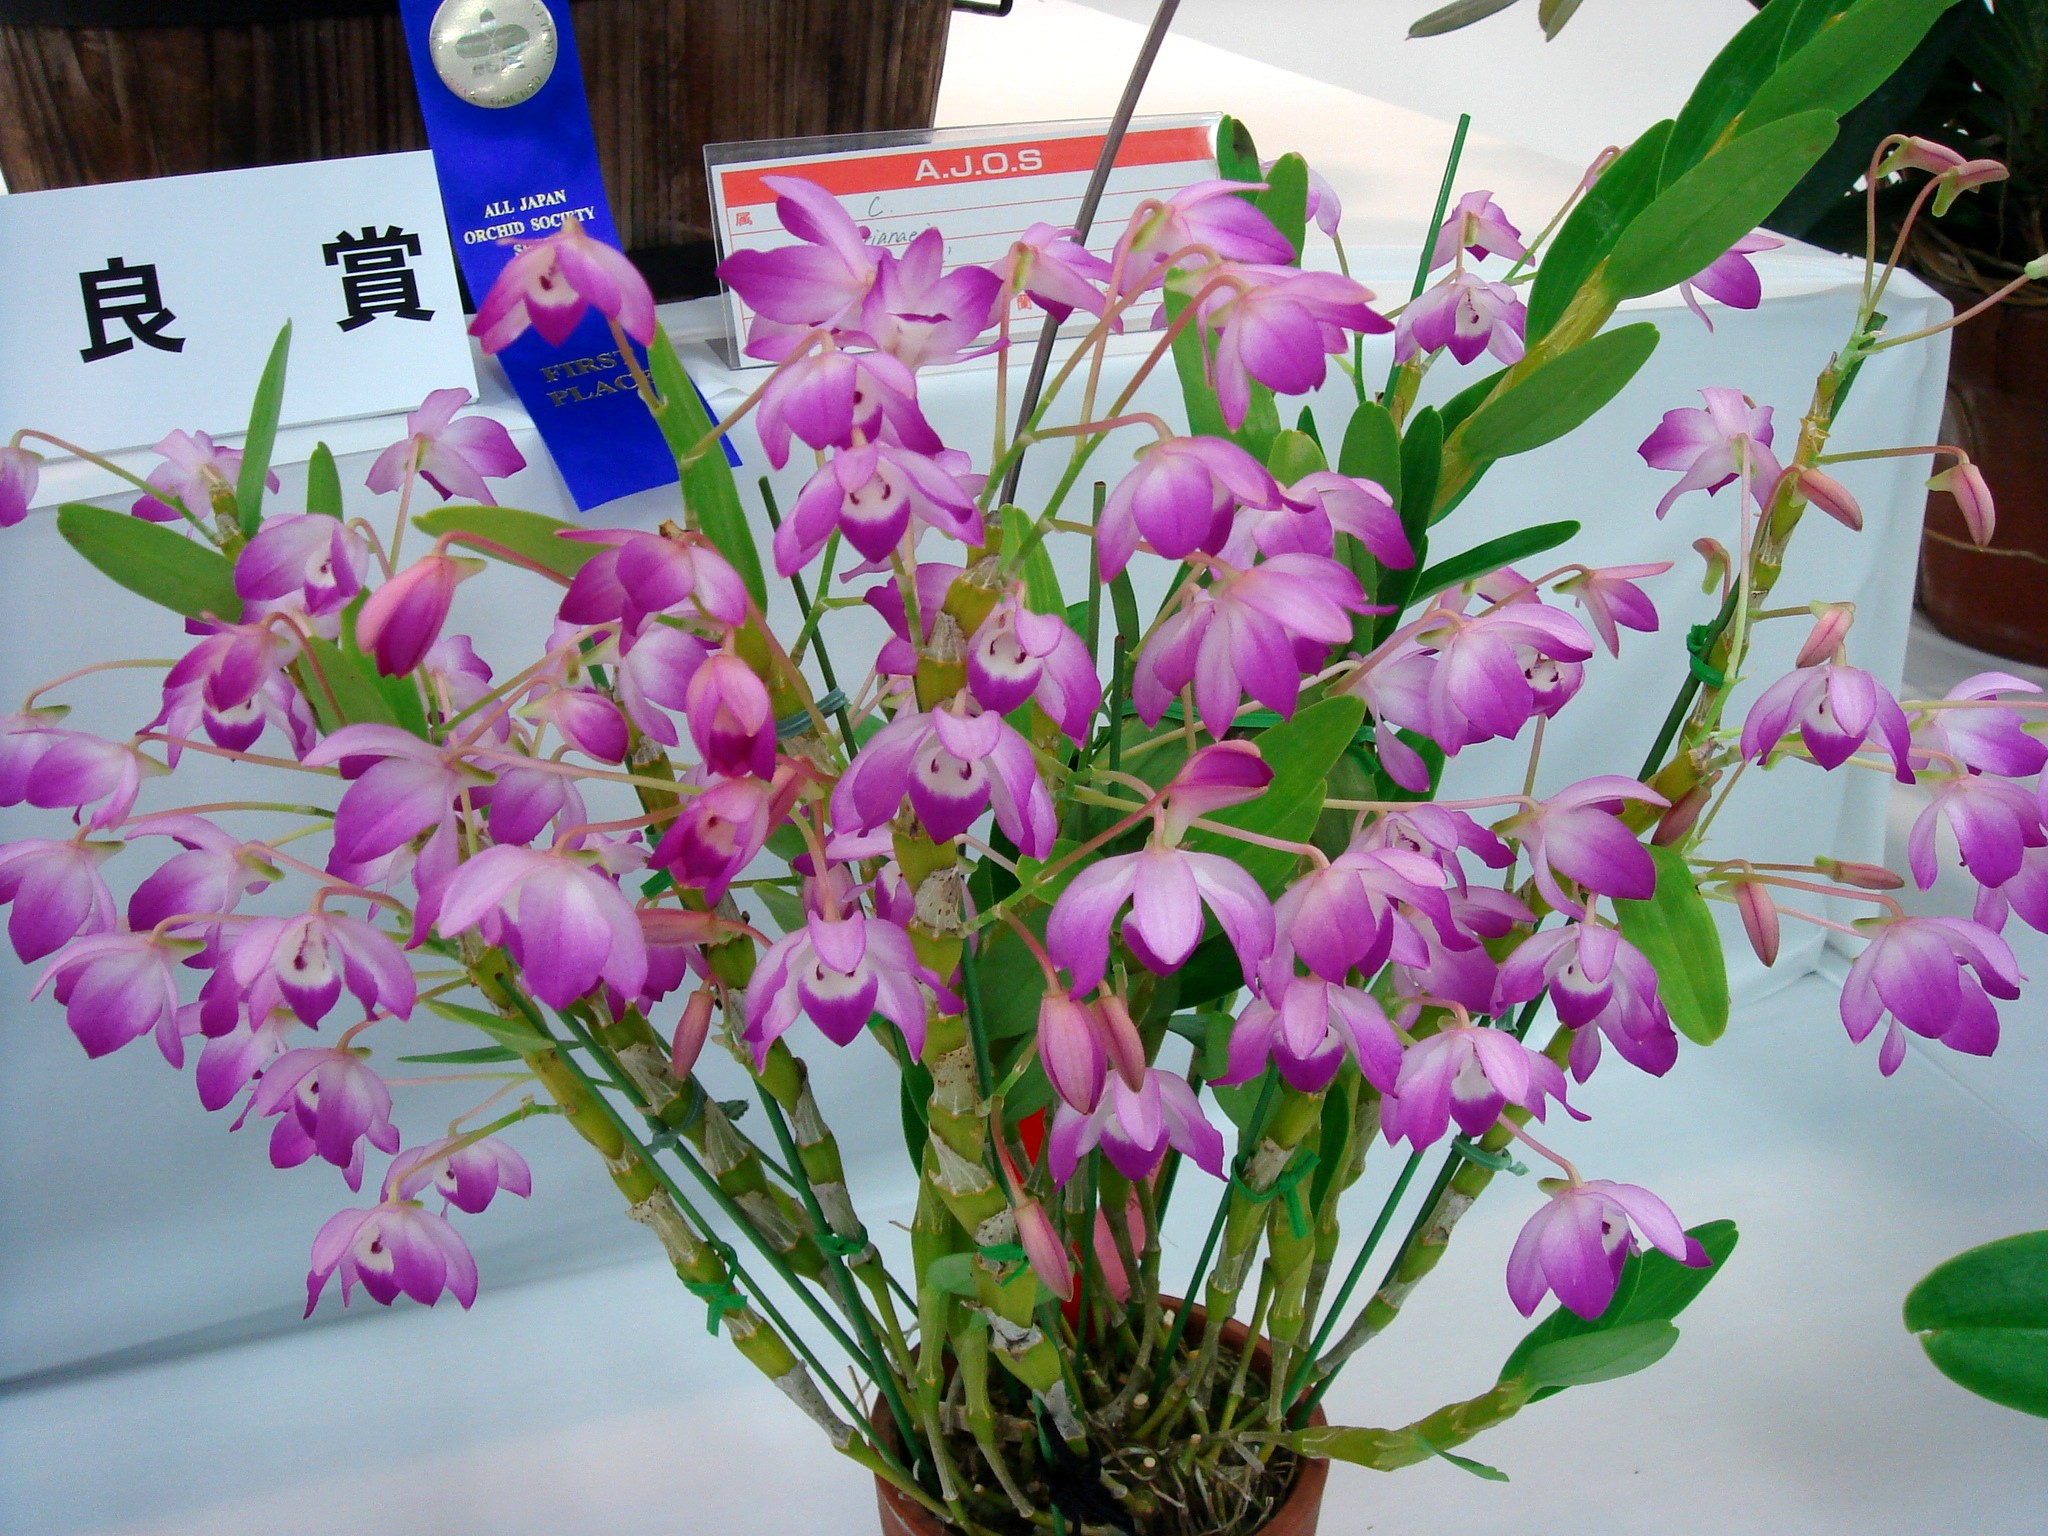 http://orchids.la.coocan.jp/Dendrobium/Dendrobium%20linawianum/DSC06974.JPG